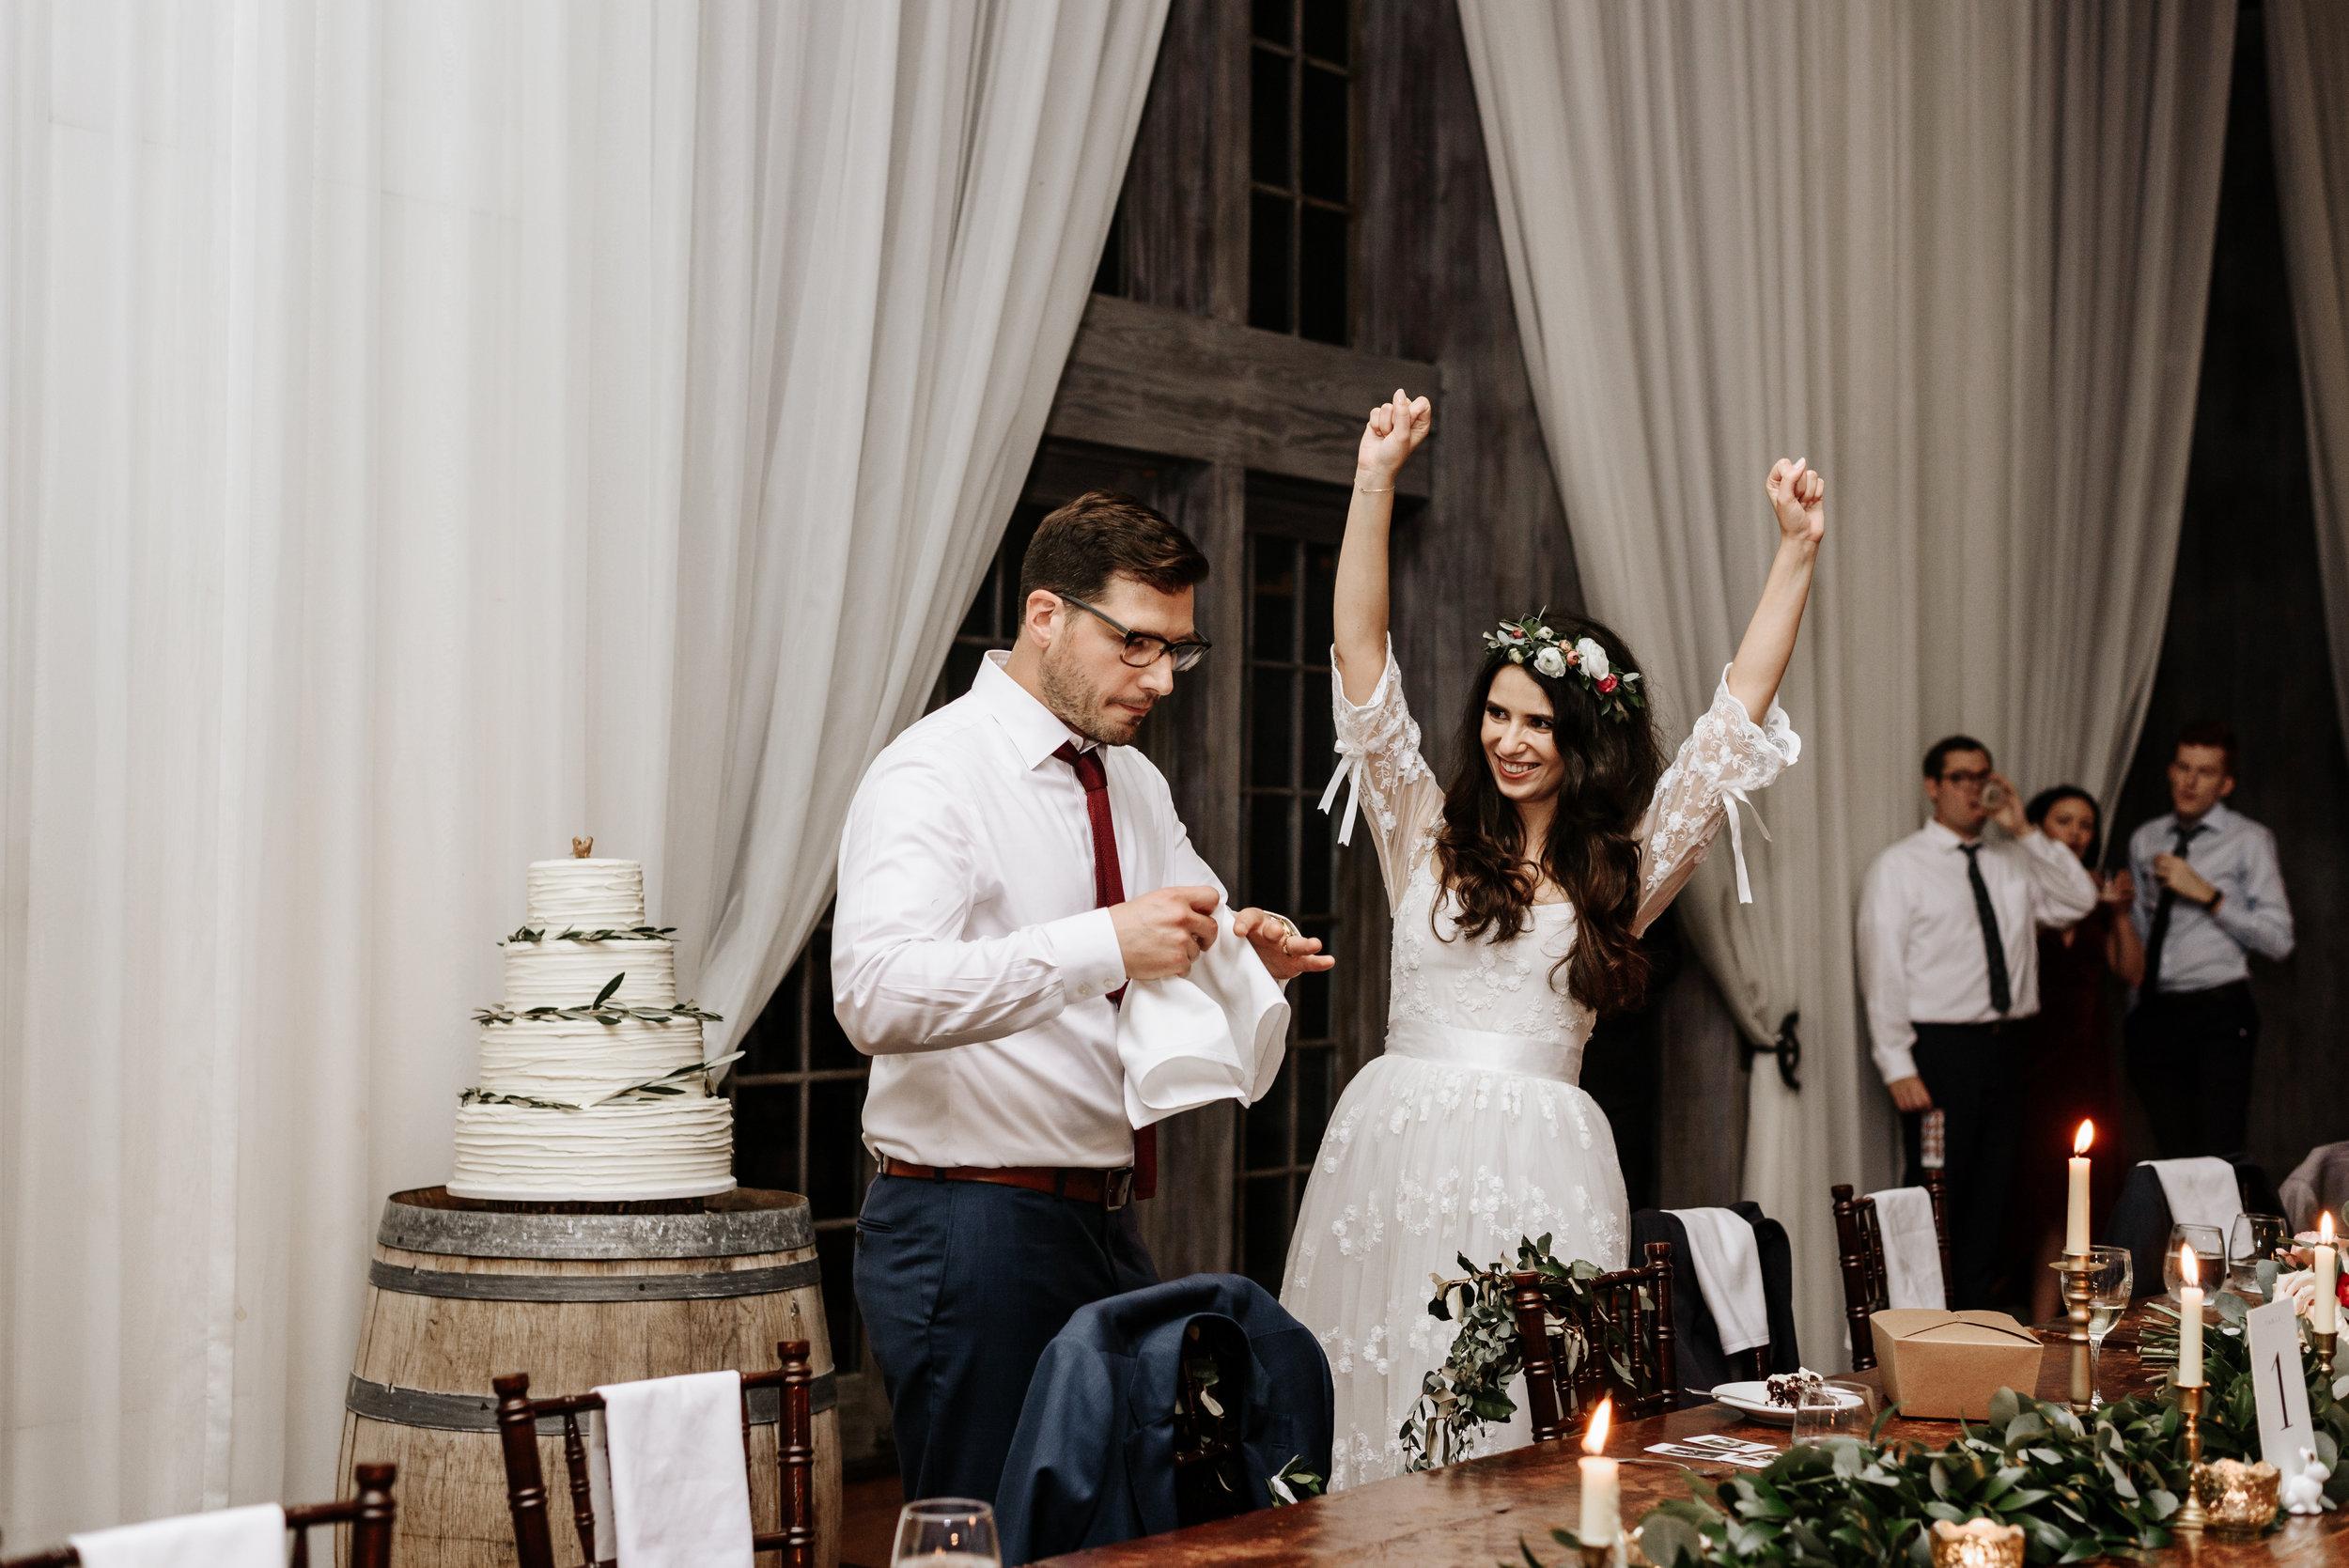 Veritas-Vineyards-and-Winery-Wedding-Photography-Afton-Virginia-Yasmin-Seth-Photography-by-V-3513.jpg